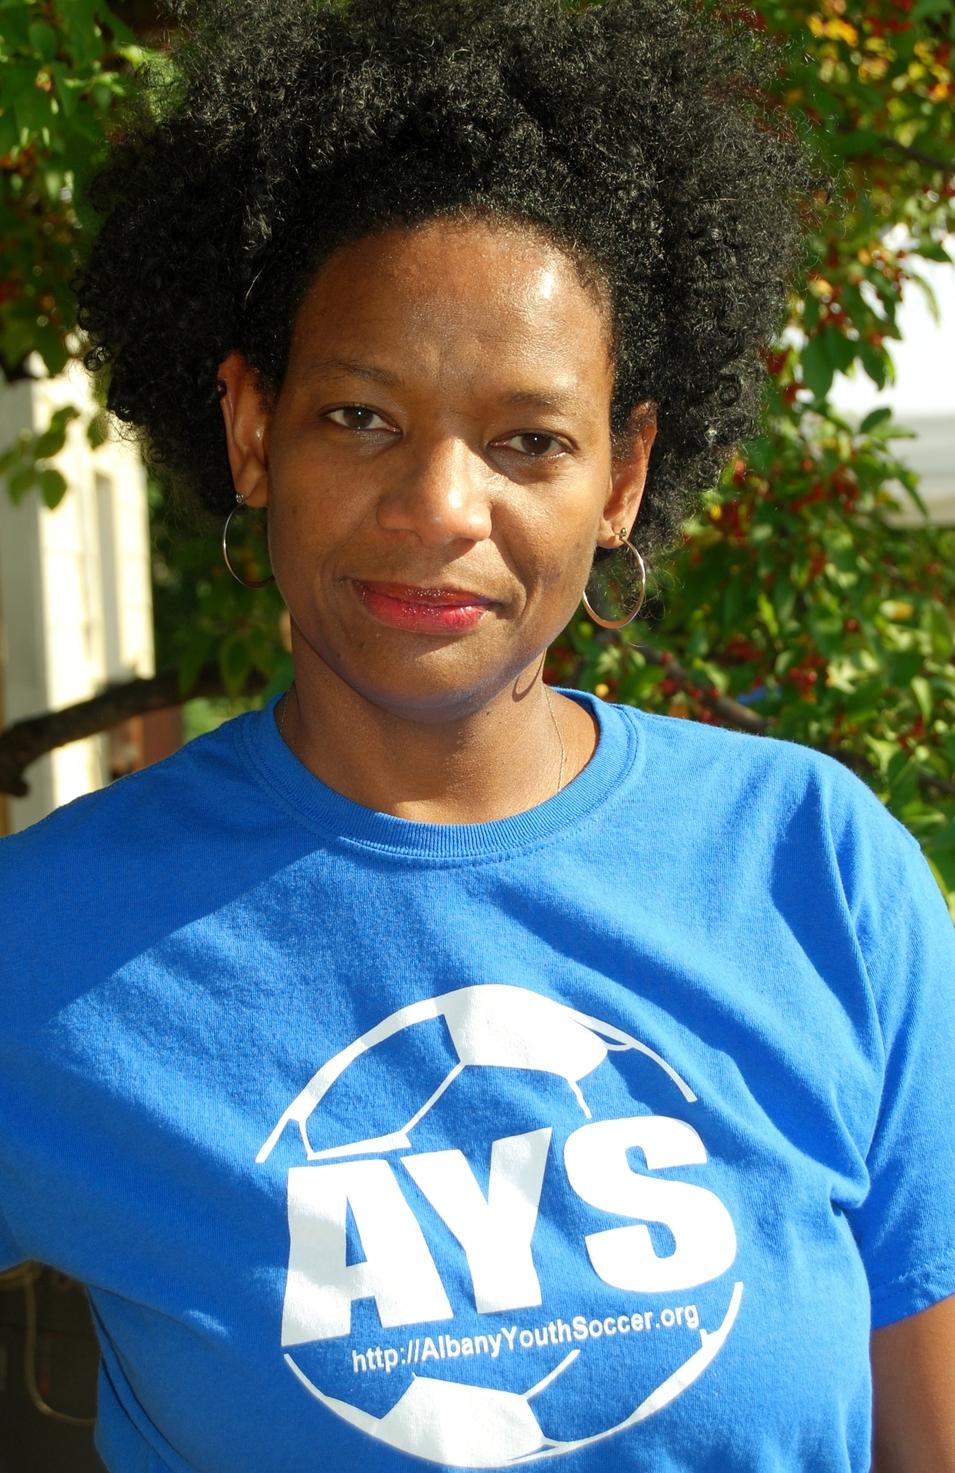 Sharon - Vice President AYS